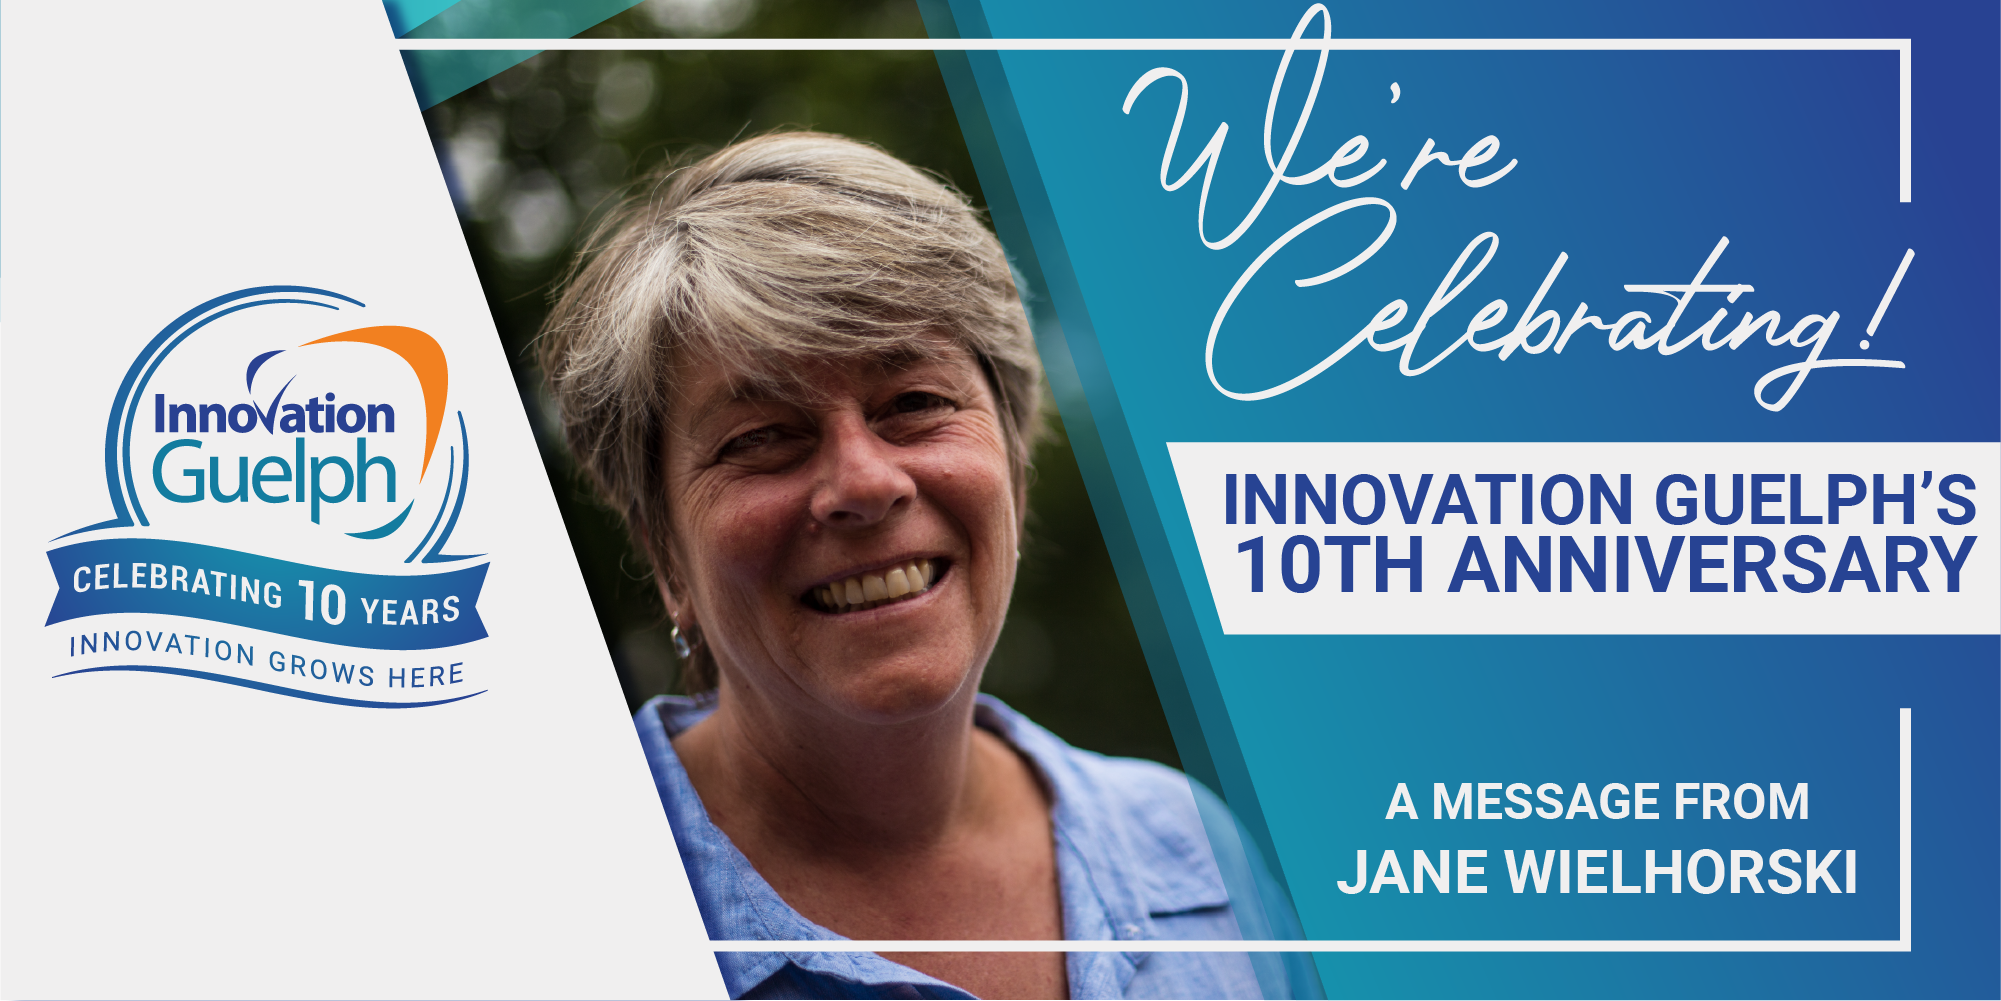 Jane Wielhorski Innovation Guelph 10th year anniversary